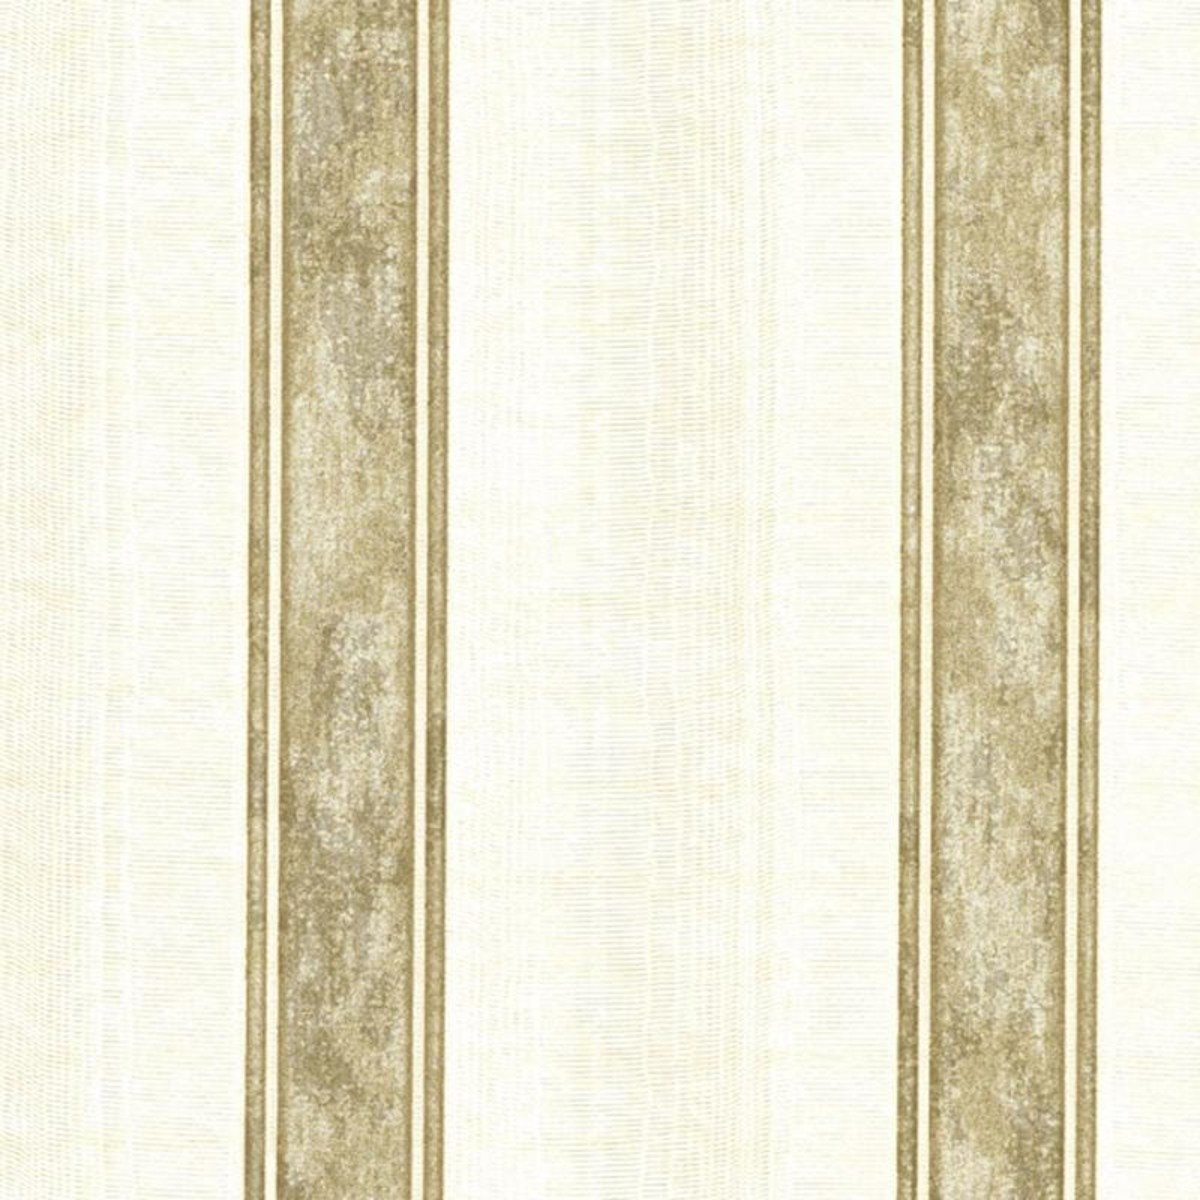 Обои флизелиновые Zambaiti Marchesa белые 1.06 м R1635